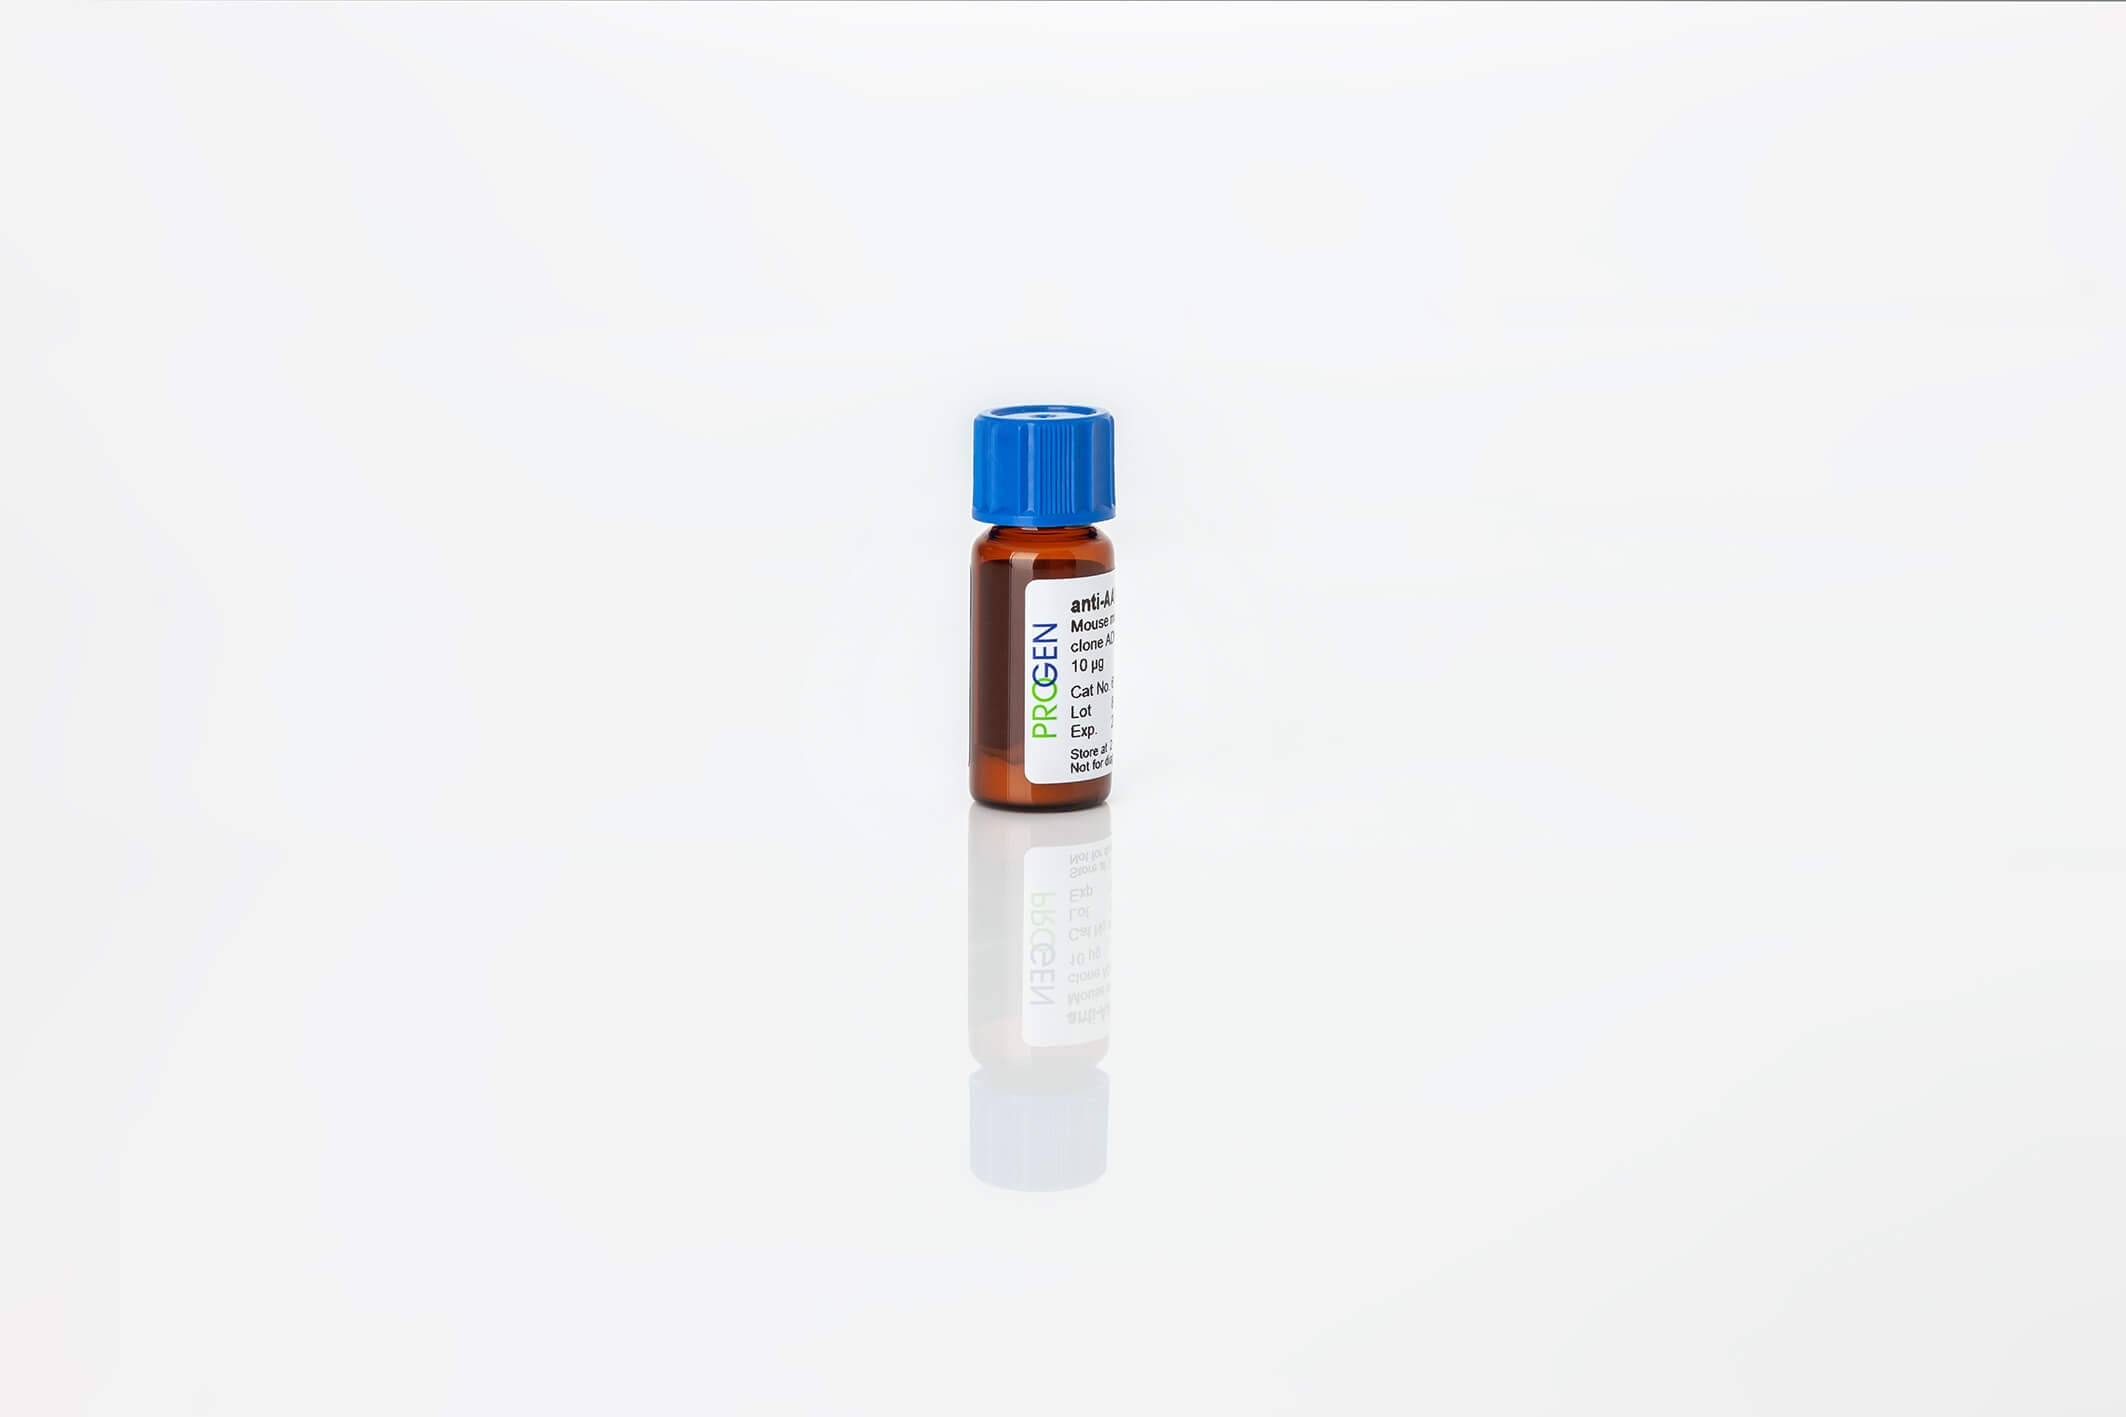 anti-Perilipin 3 (mouse N-Terminus) guinea pig polyclonal, serum